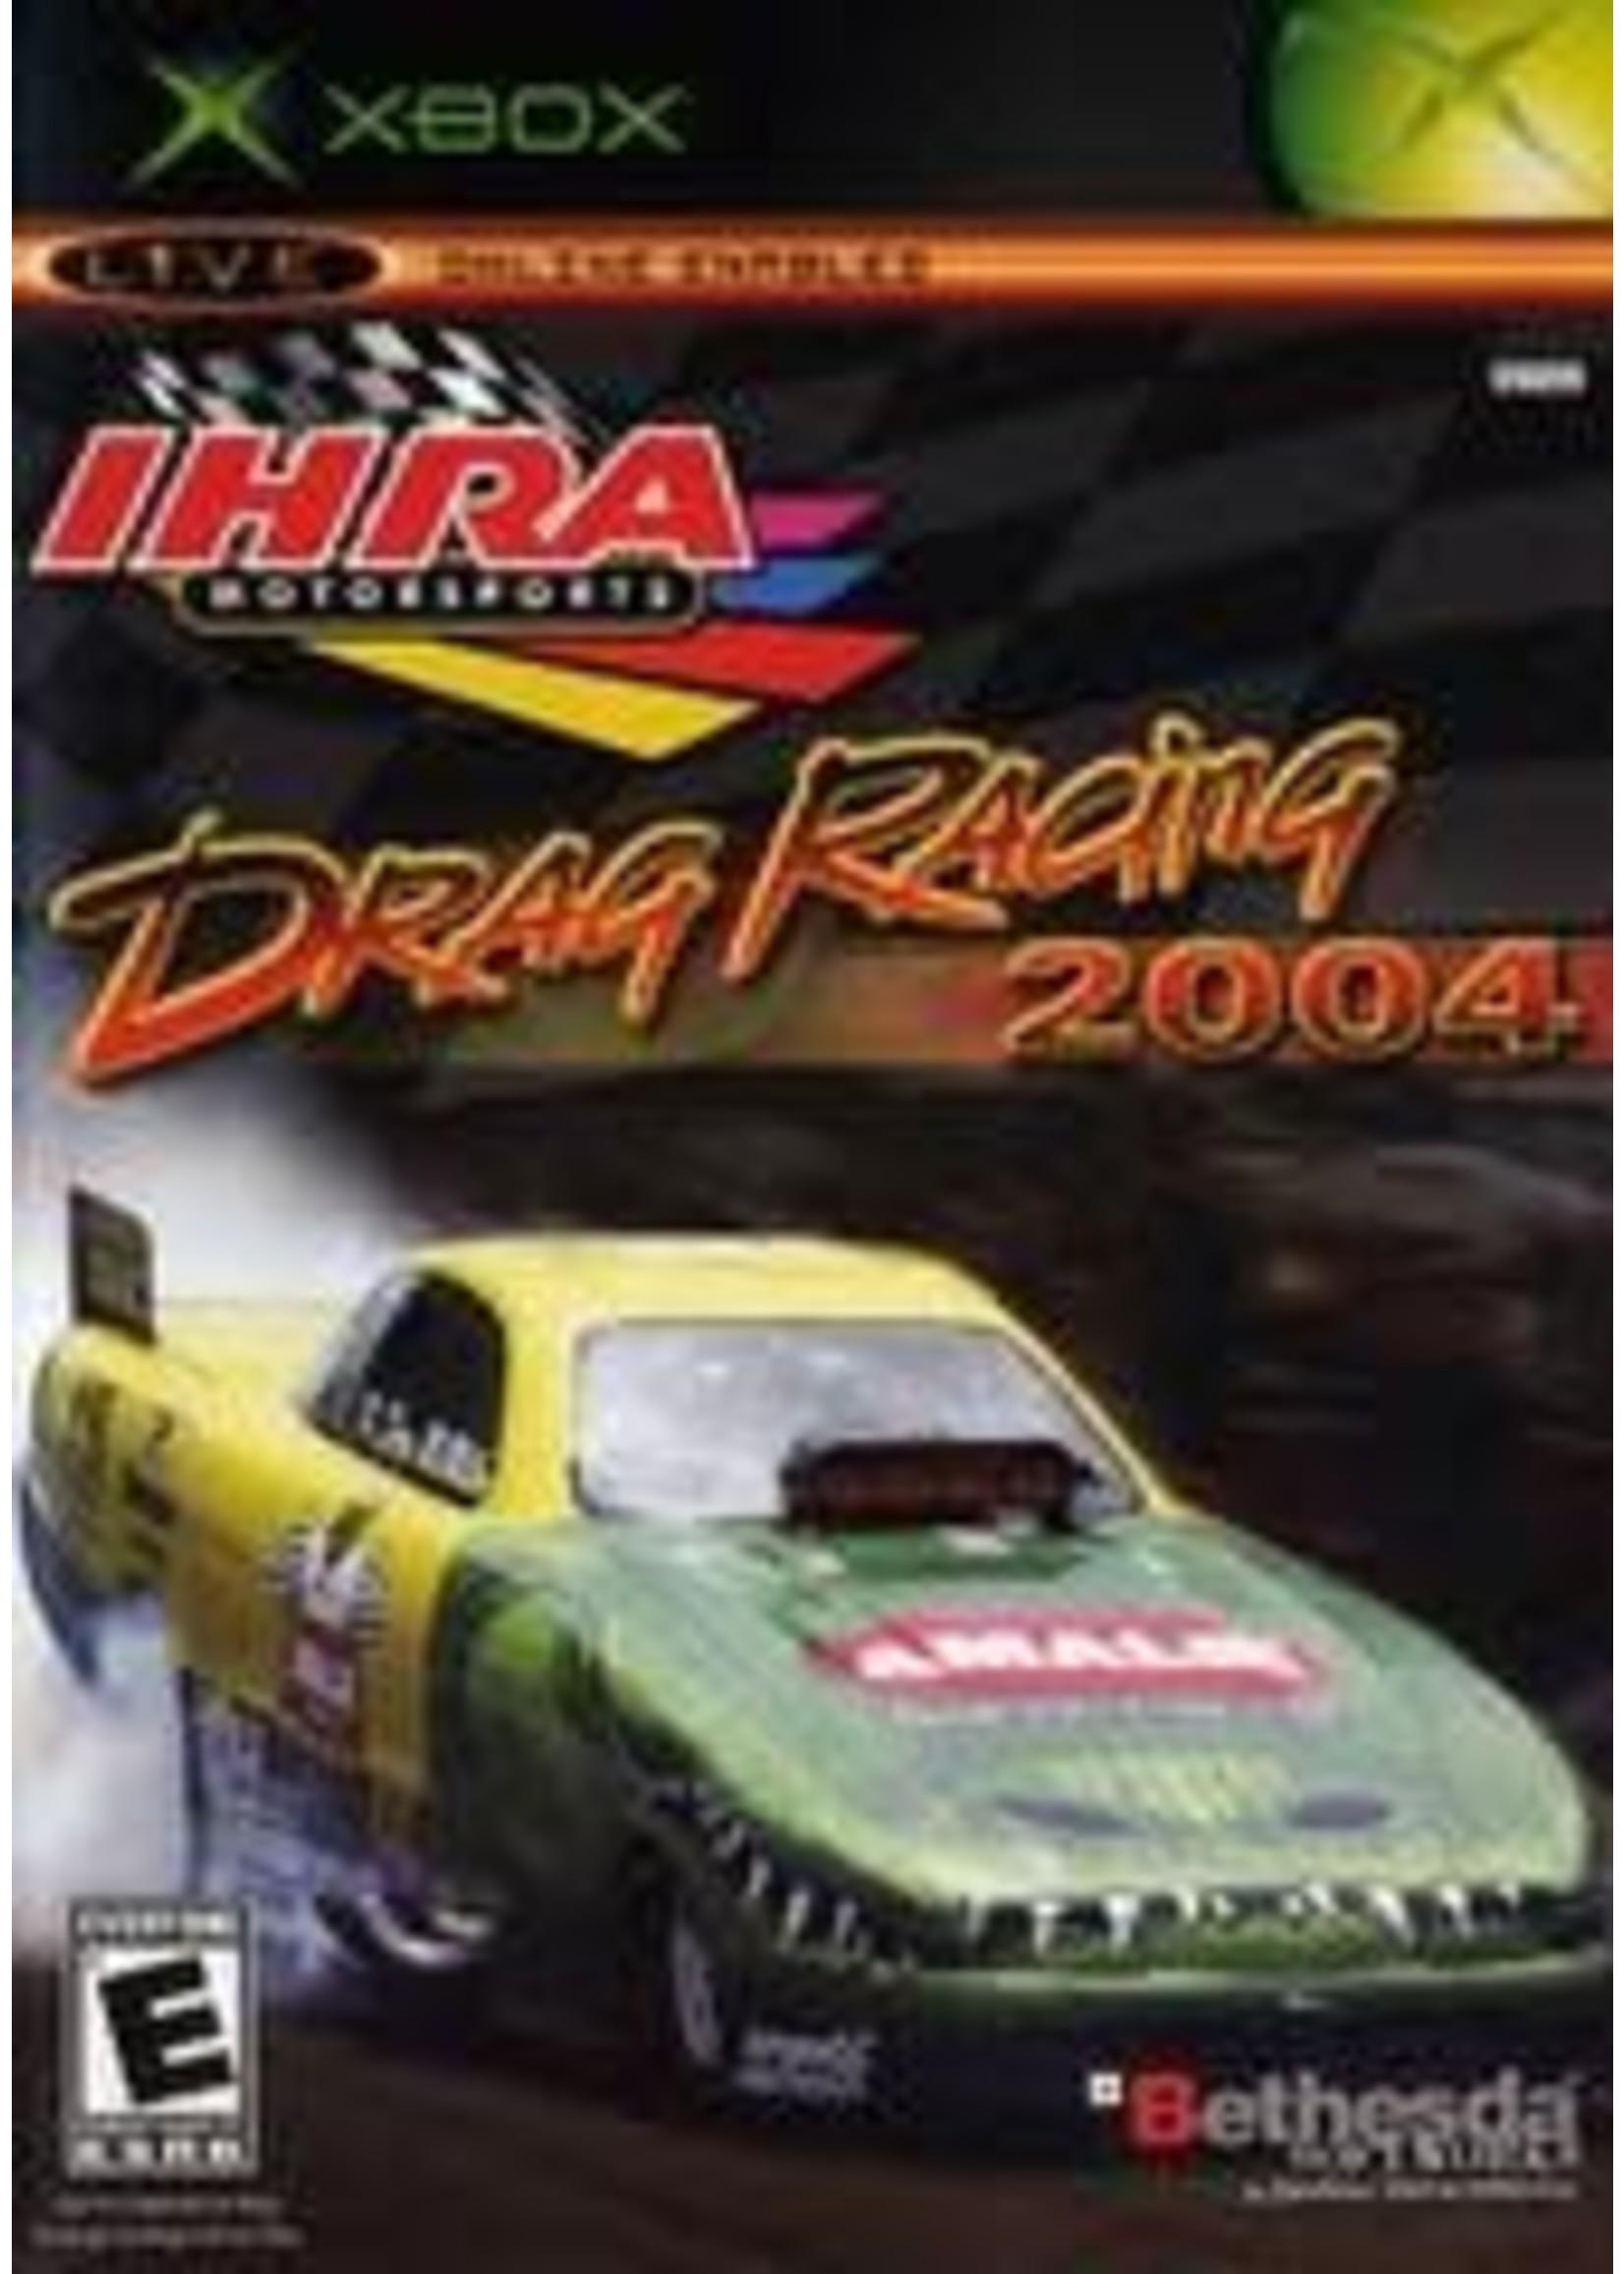 IHRA Drag Racing 2004 Xbox